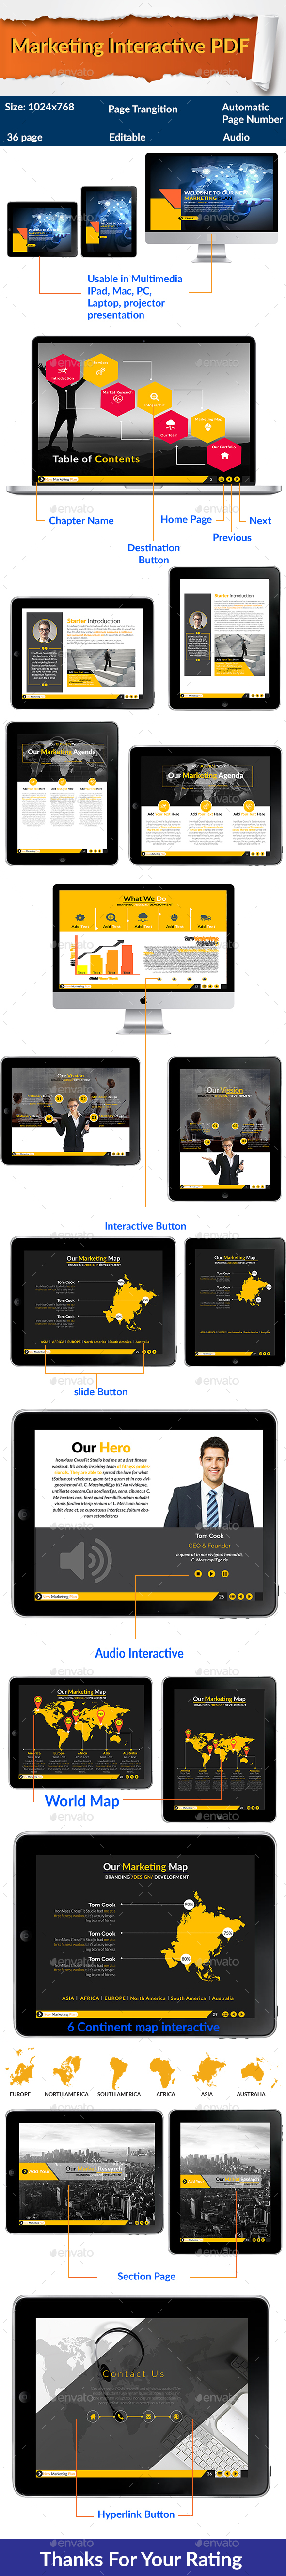 Marketing Plan Interactive PDF - Digital Books ePublishing